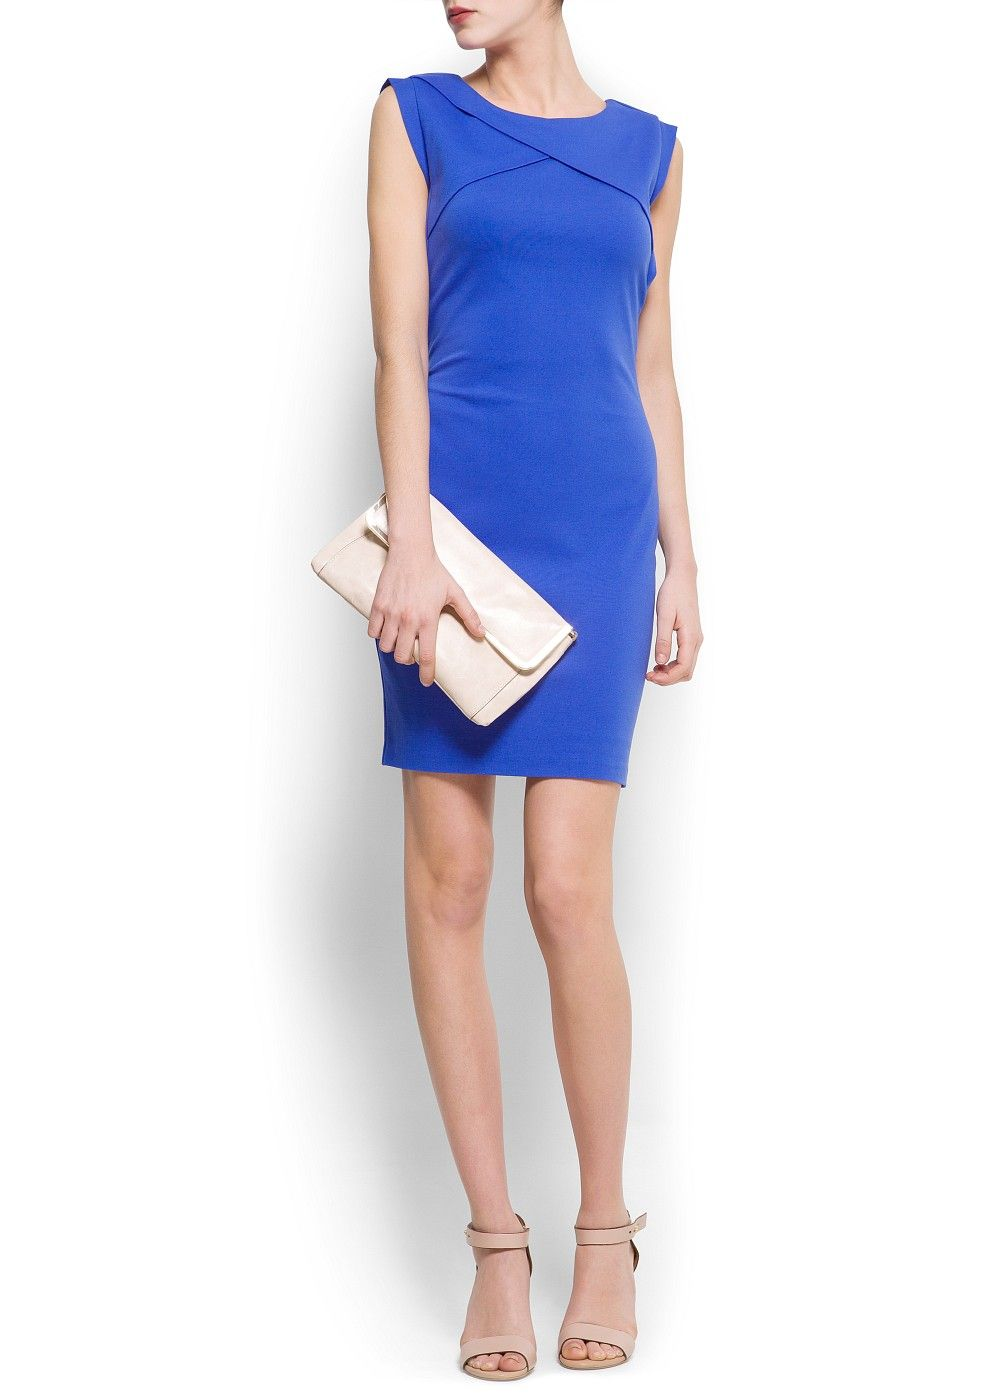 8f03d8106d0360 MANGO - KLEDING - Jurken - Blauw - Origami stretch jersey jurk